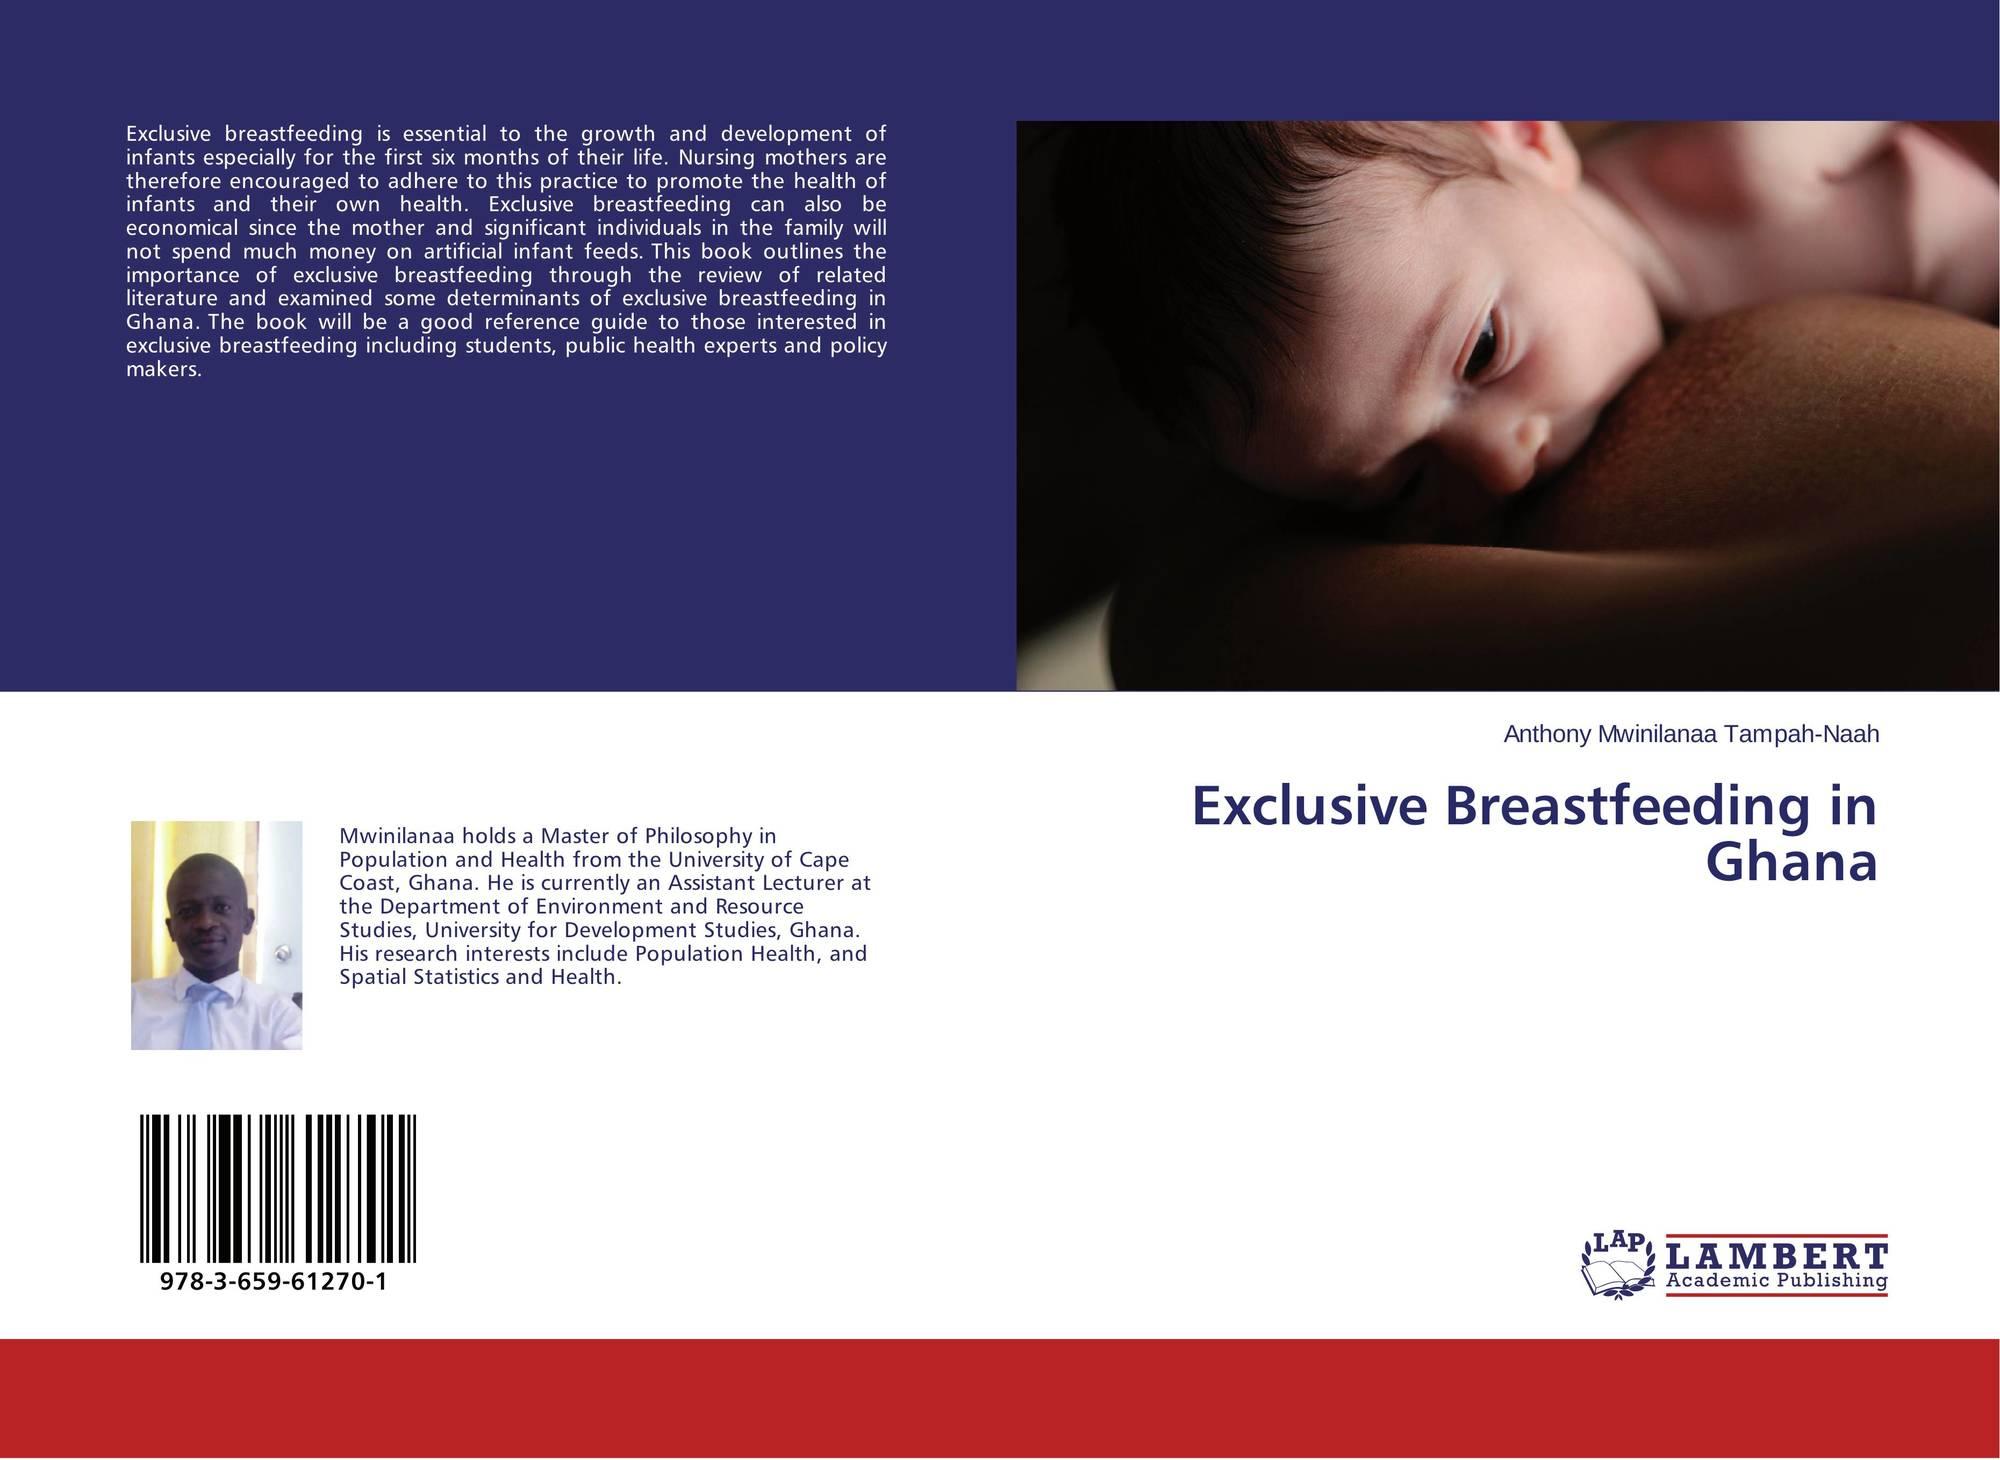 thesis on exclusive breastfeeding in ghana